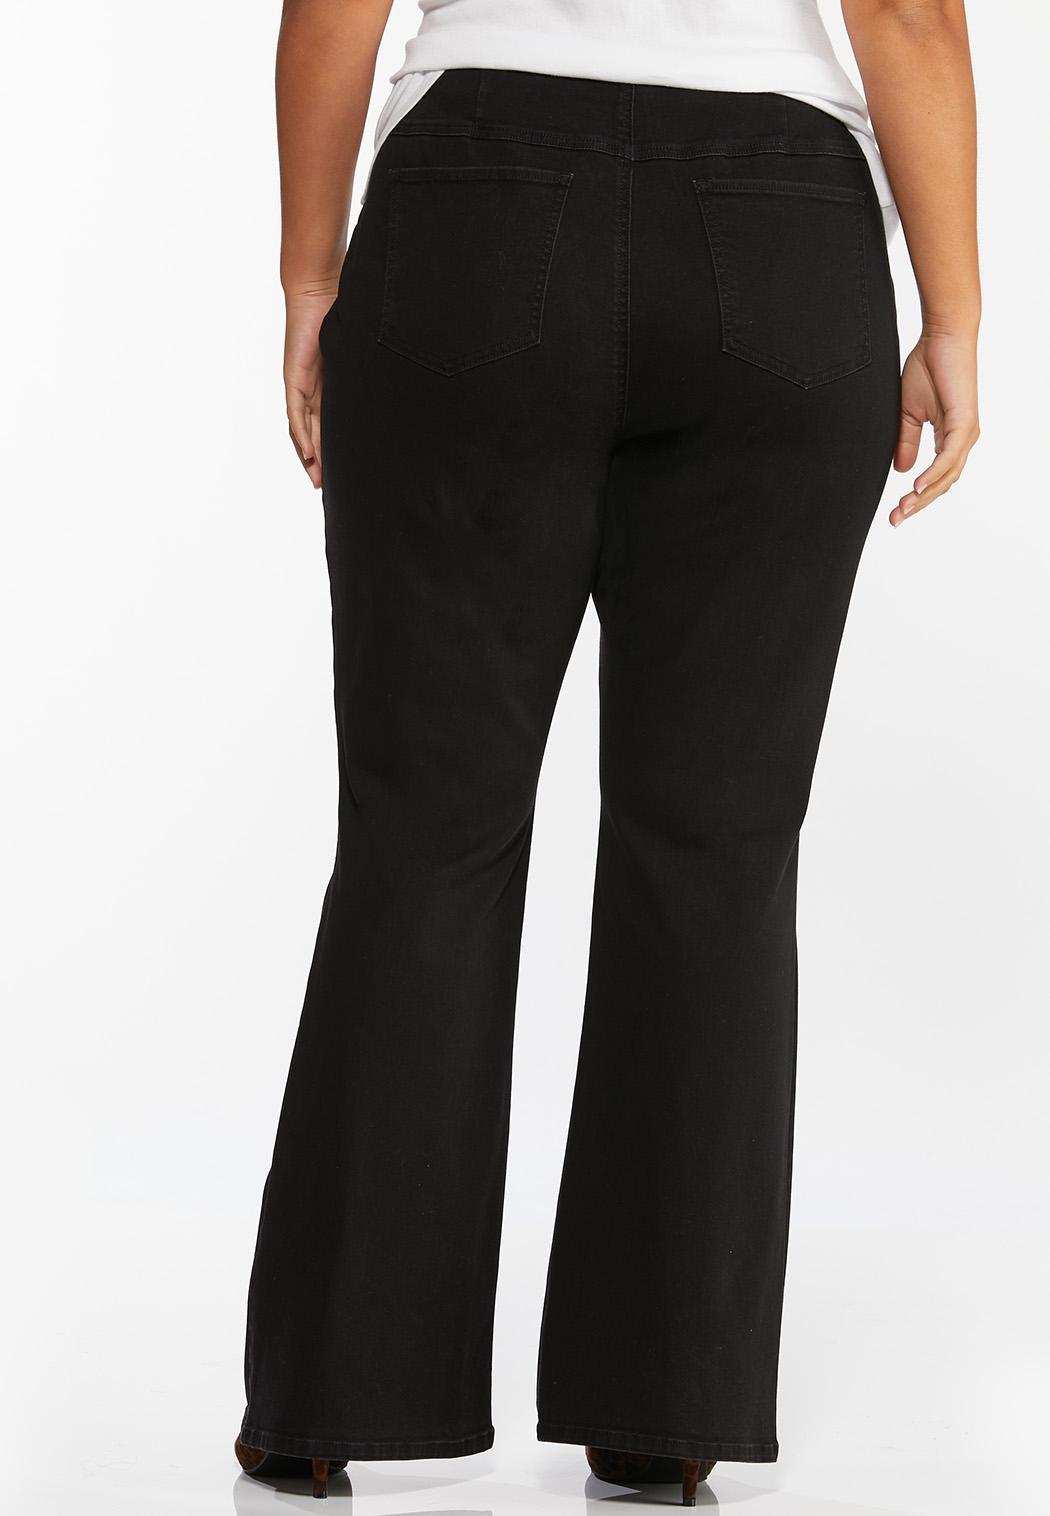 Plus Size Black Pull-On Flare Jeans (Item #44422845)